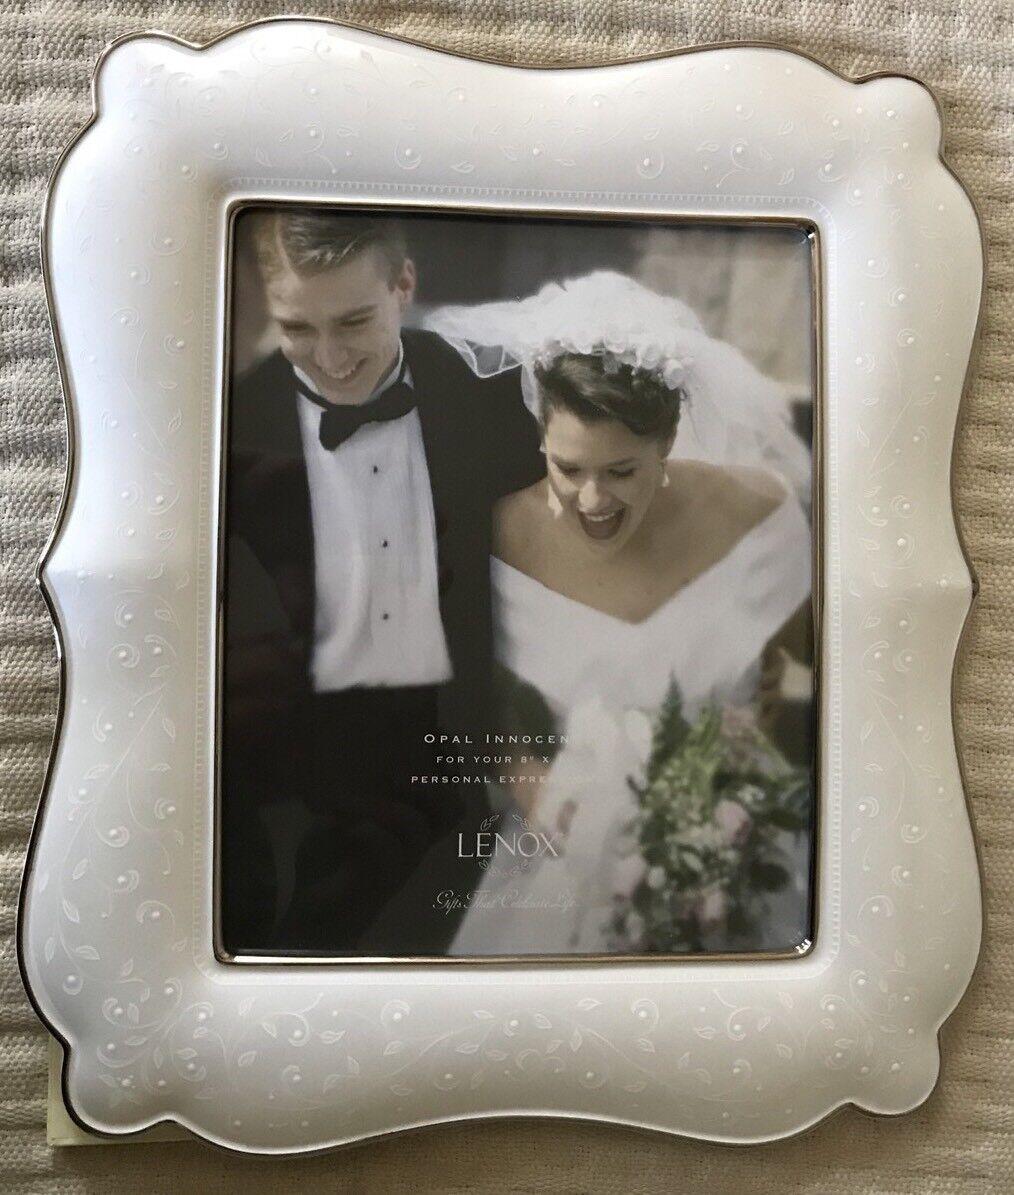 Lenox Opal Innocence Wedding Promises 8x10 Picture Frame 6225924 | eBay